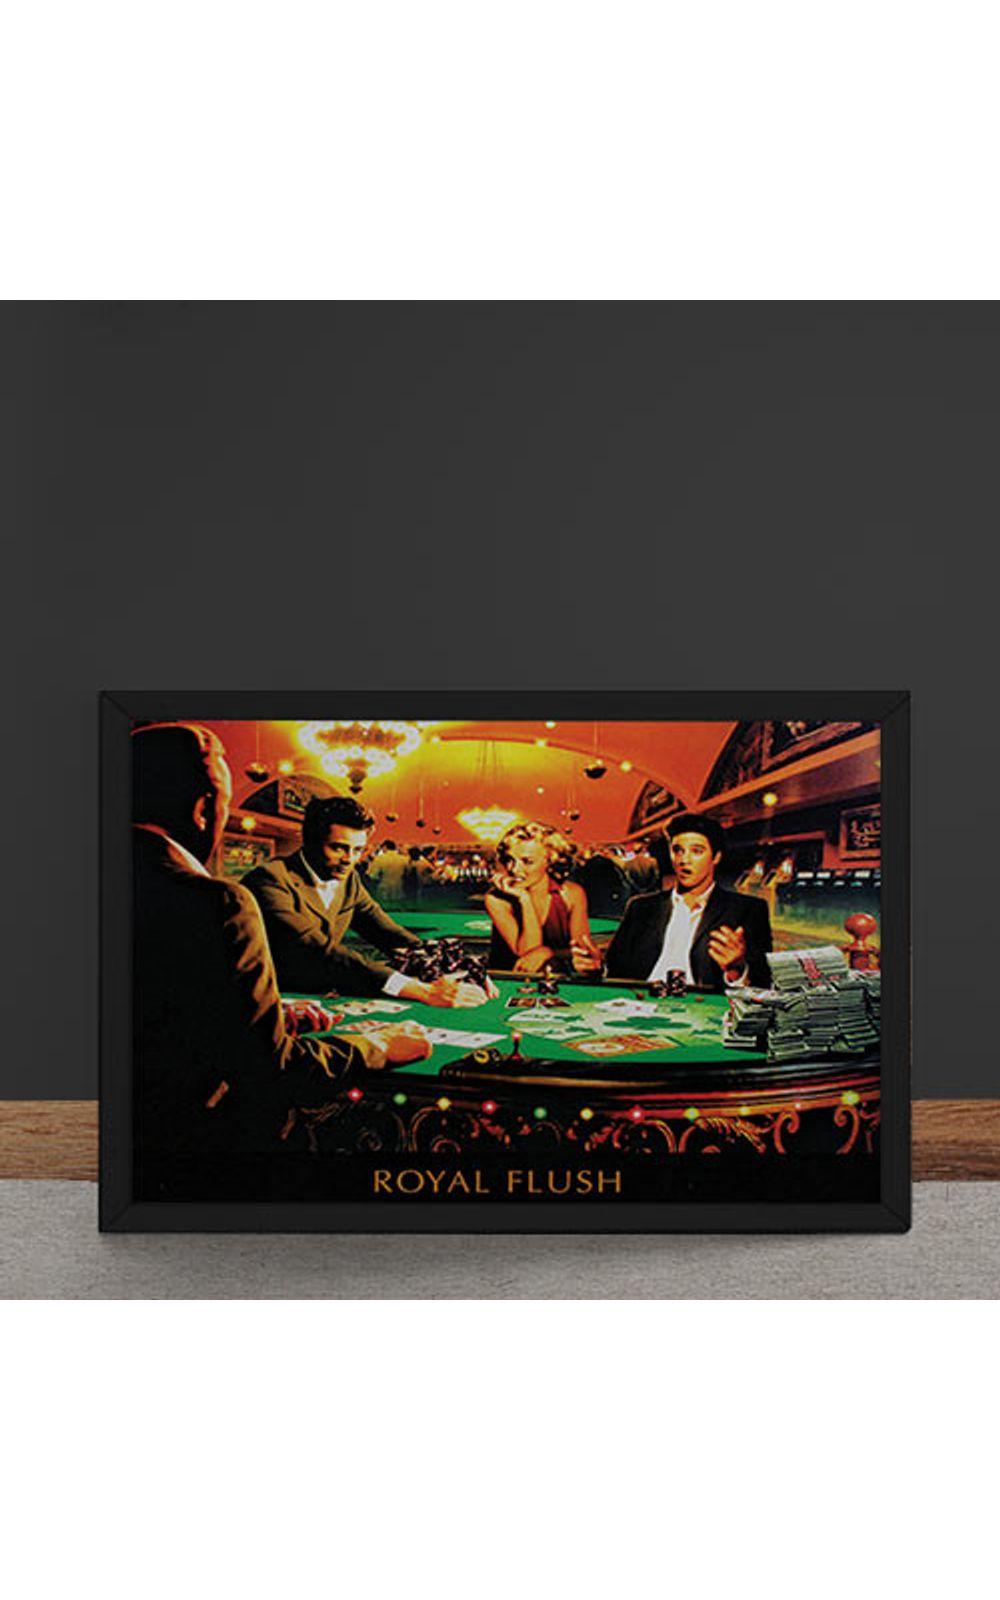 Foto 4 - Quadro Decorativo Poker Royal Flush Marylin Monroe Elvis Presley James Dean Humphrey Bogart